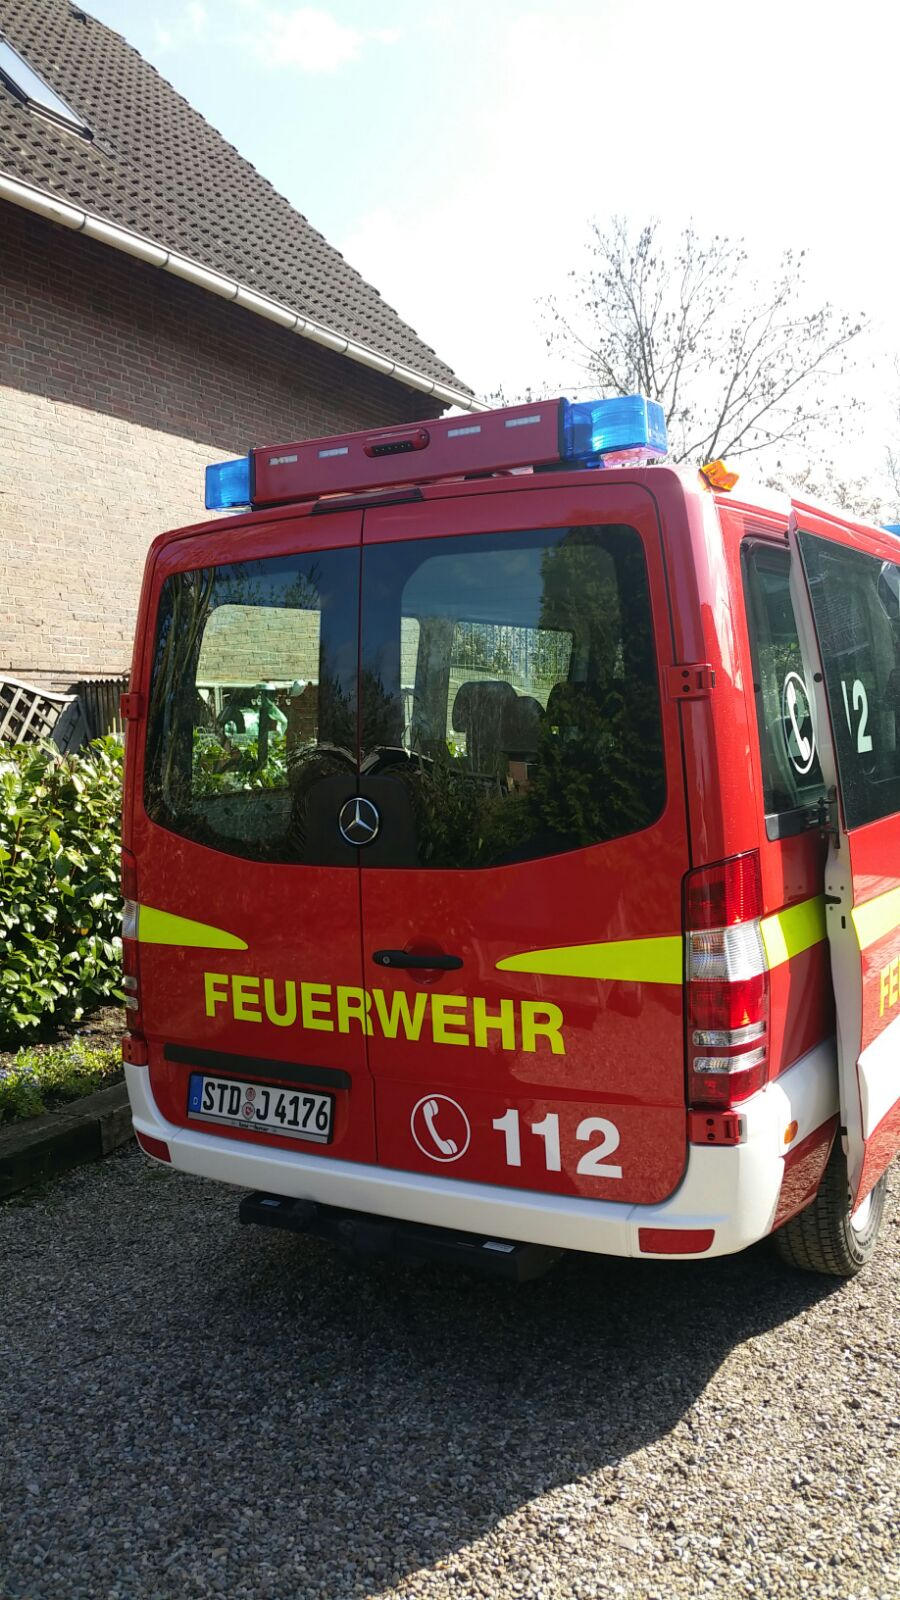 https://www.feuerwehr-buxtehude.de/media/img/bilder_ow_im/bilder_im_fa/mtf/4176d.jpg